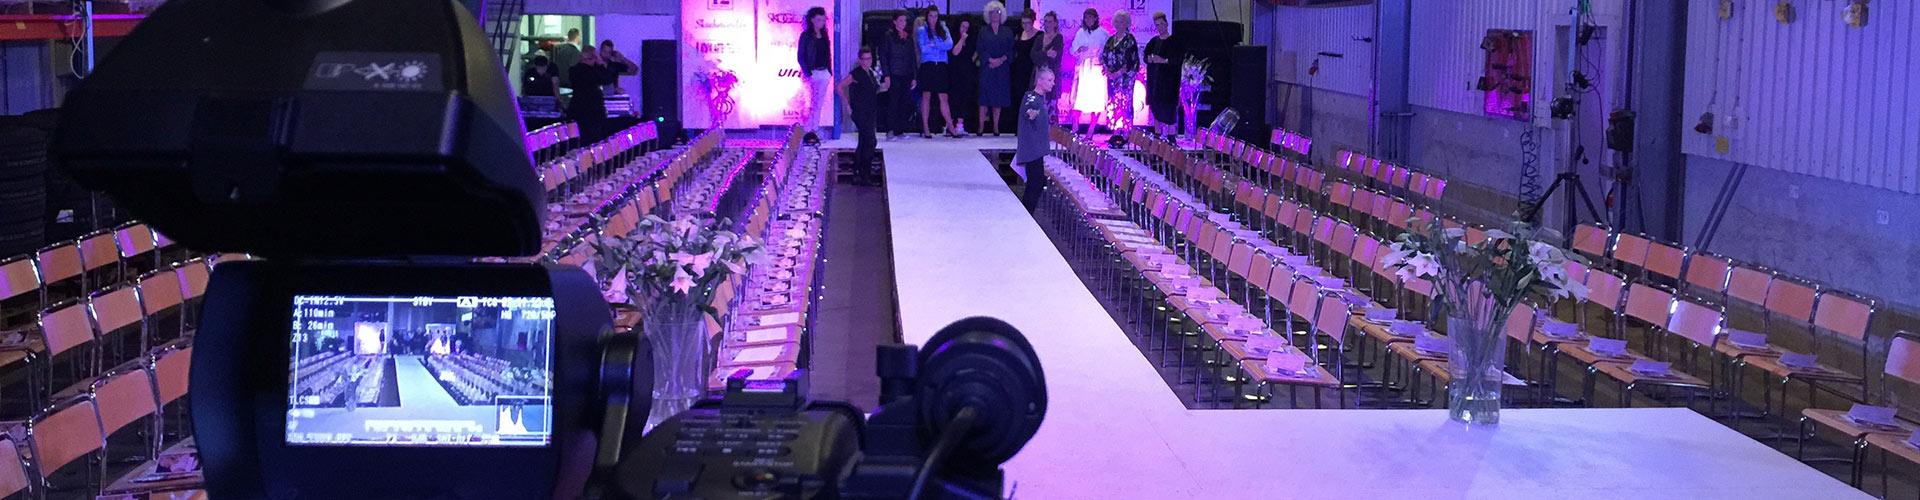 Inspelning av modeshow på catwalk